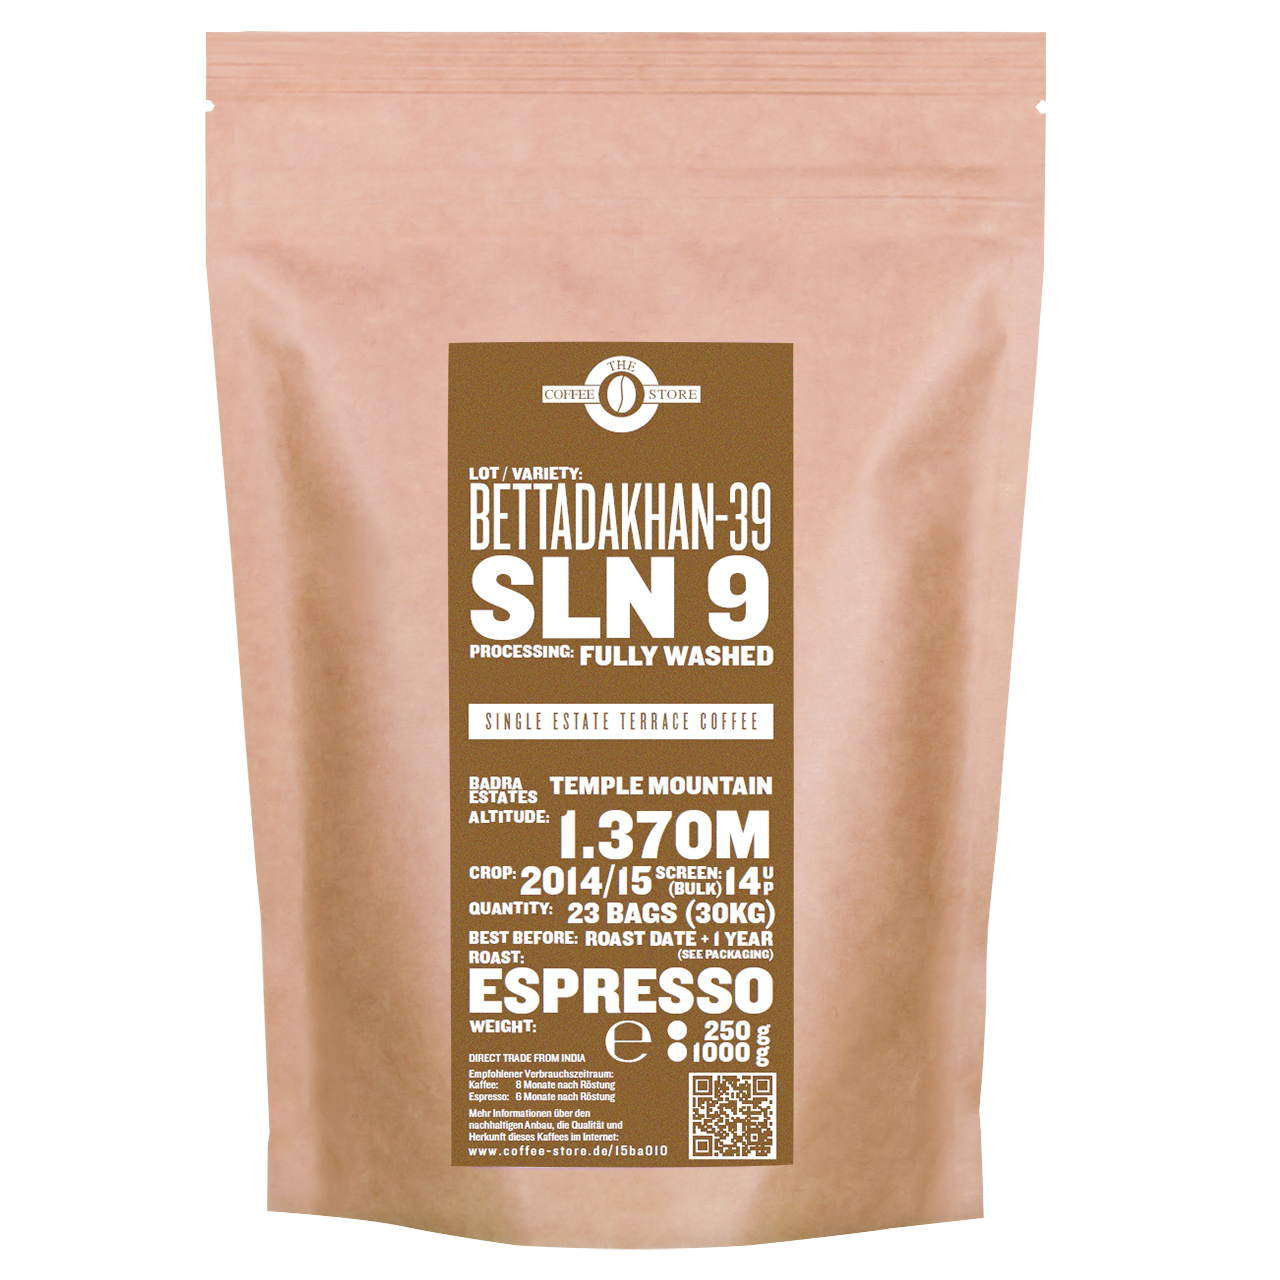 Bettadakhan - 39, SLN 9 - Espressoröstung